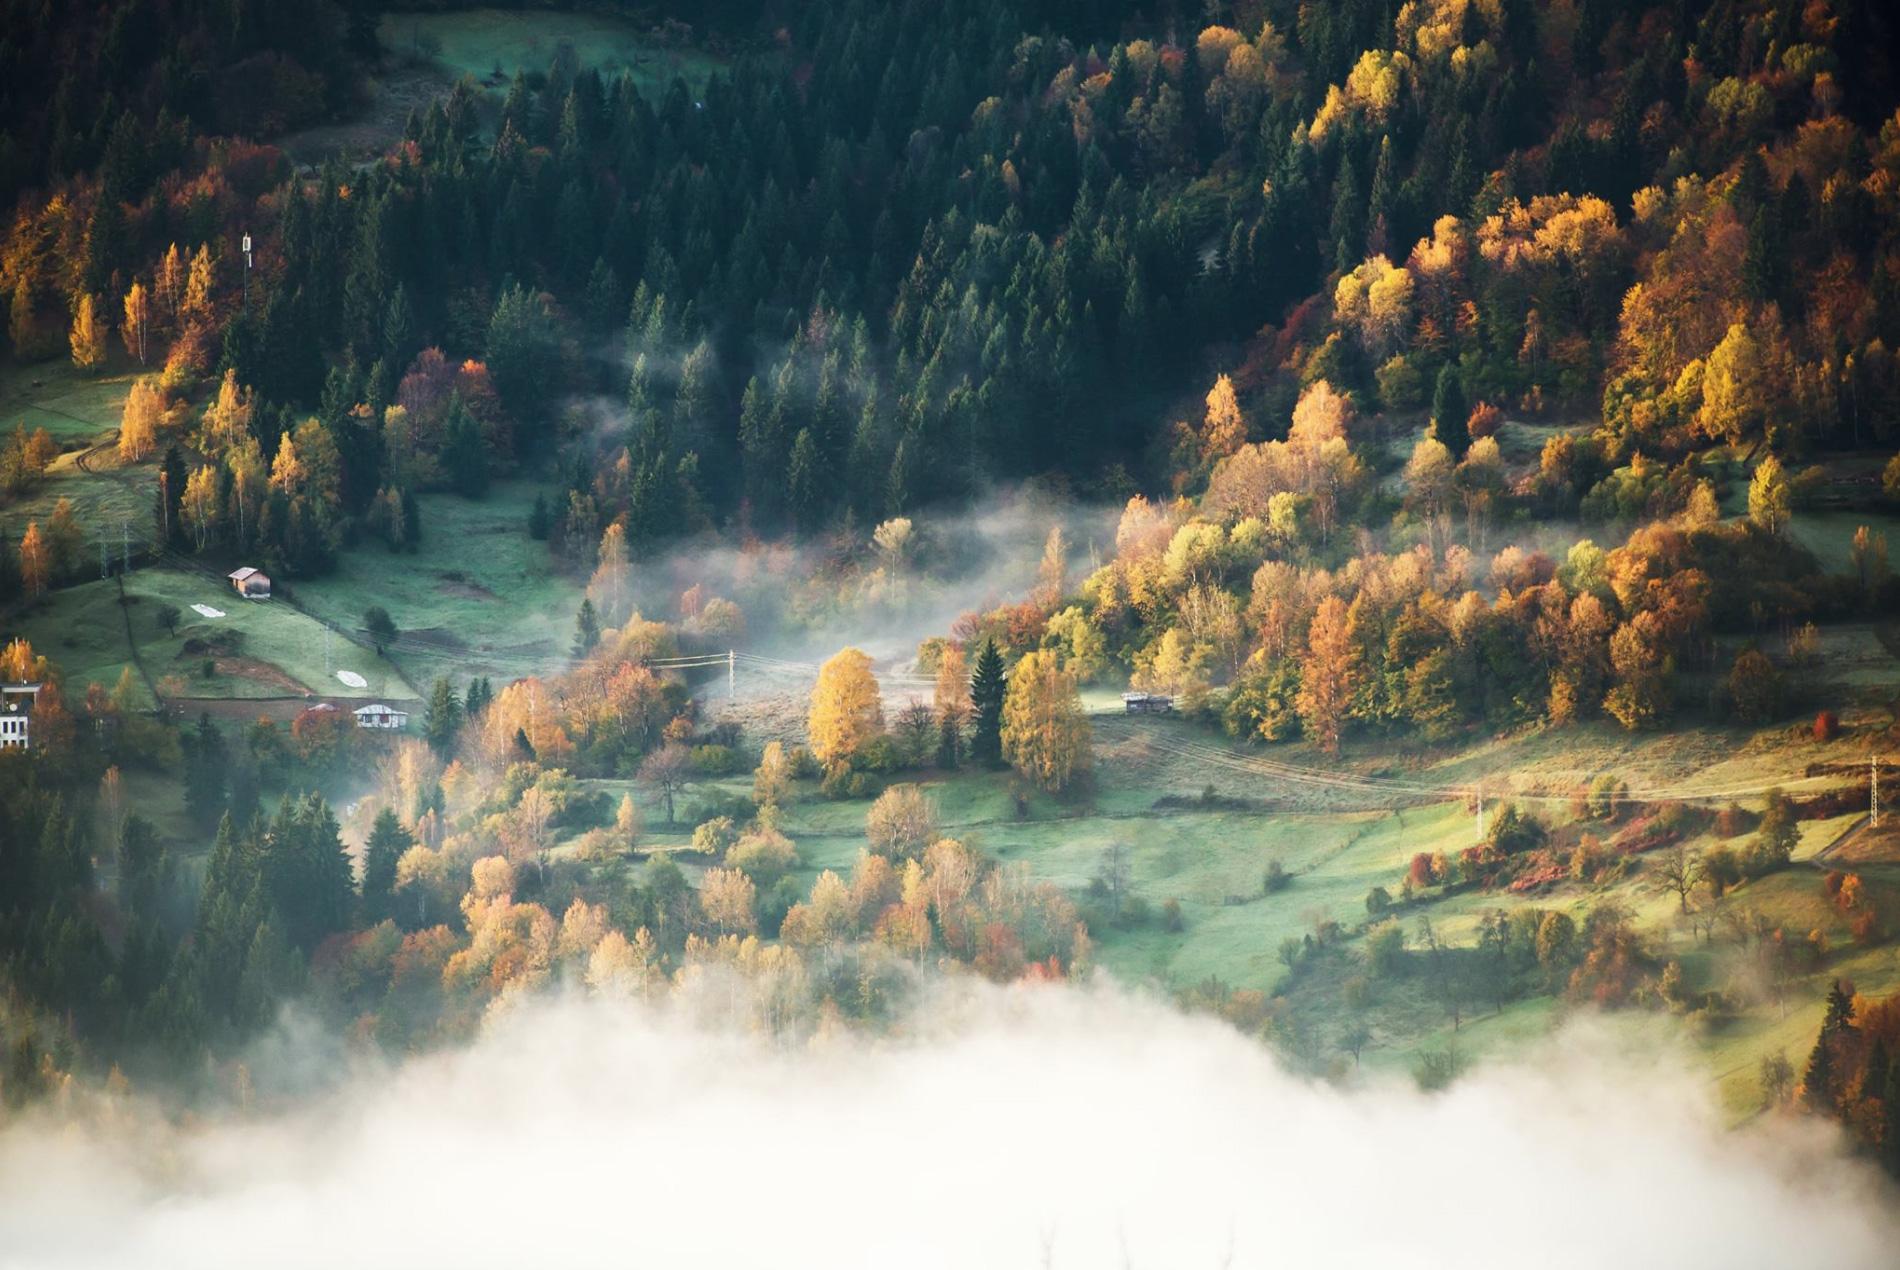 depositphotos-mistylandscape.jpg